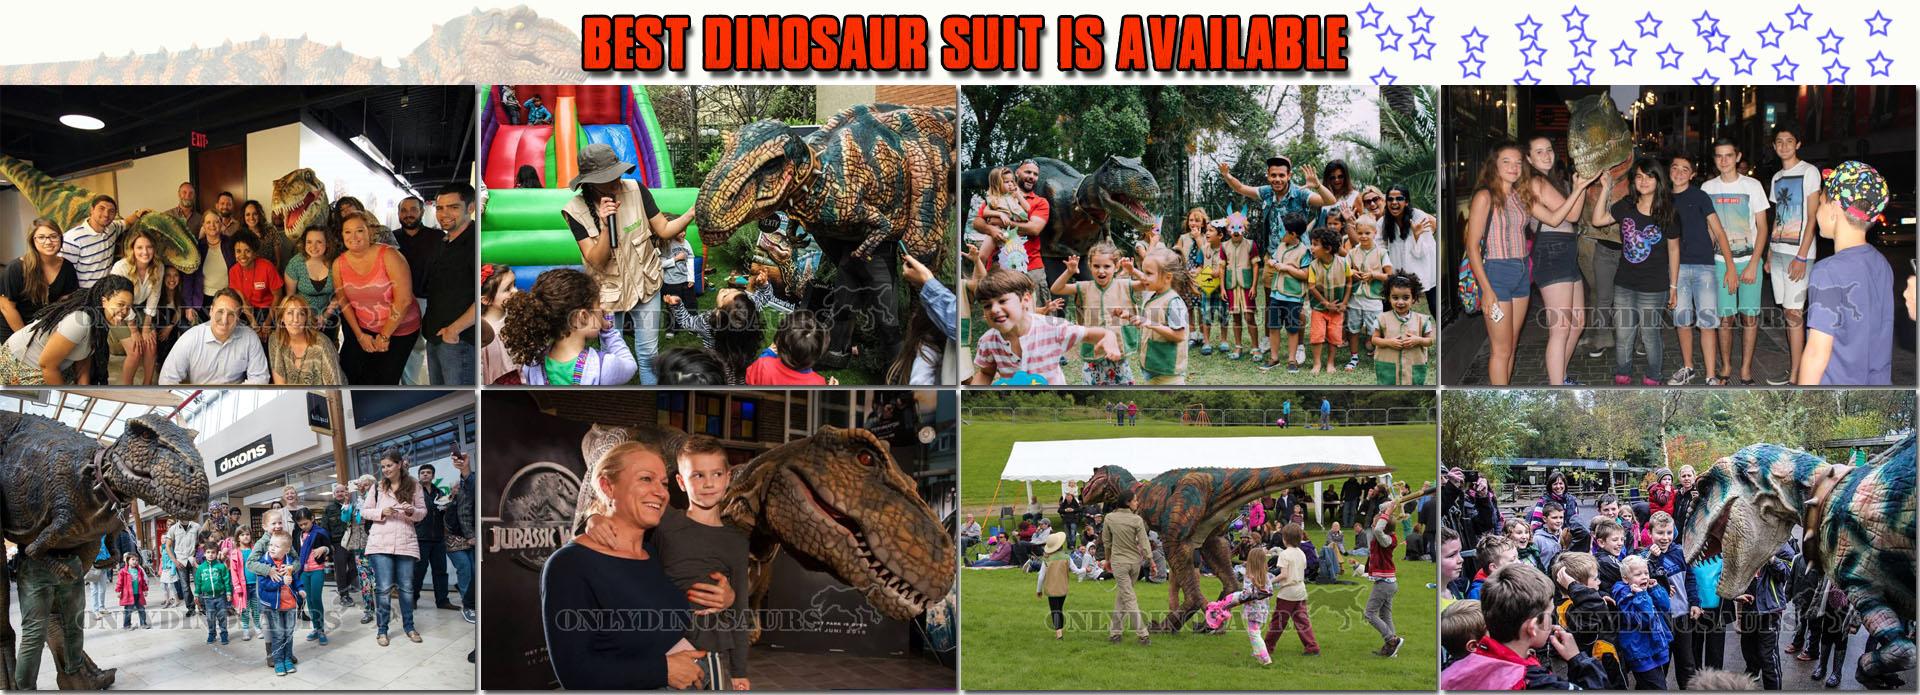 Best Dinosaur Suits Here